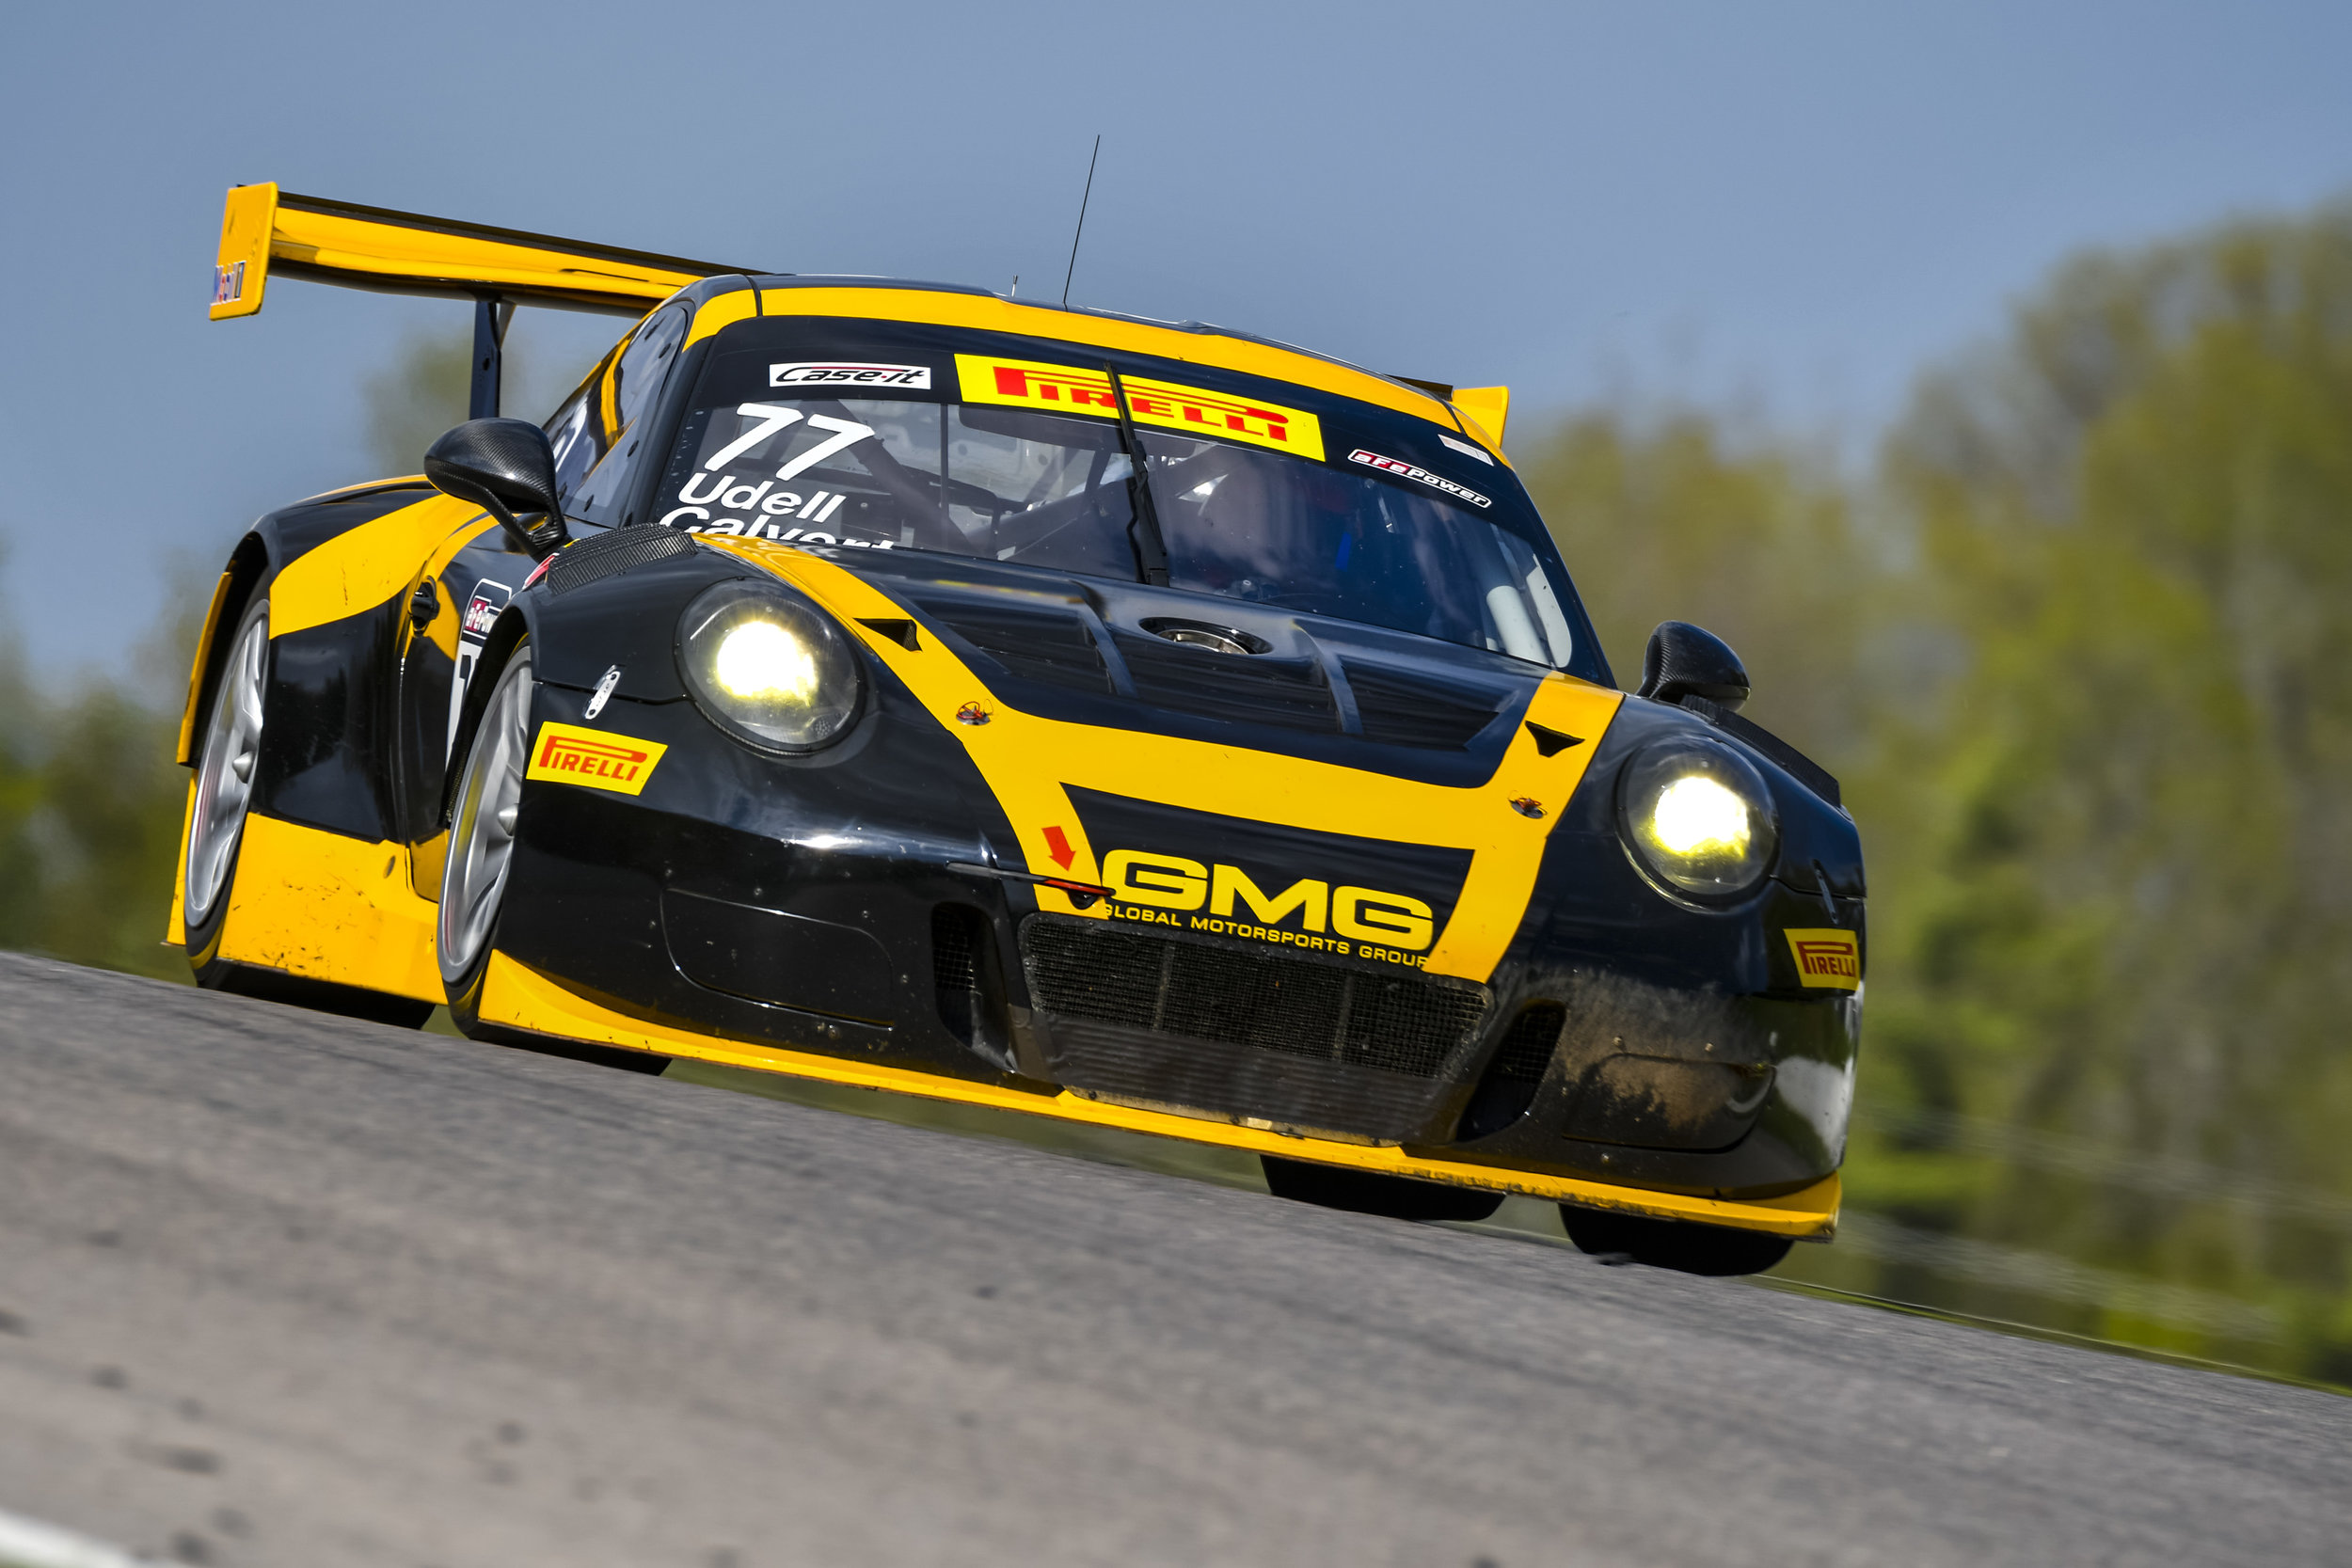 No. 77 Calvert Dynamics Porsche 911 GT3 R at speed at CTMP. Image courtesy of PCNA.